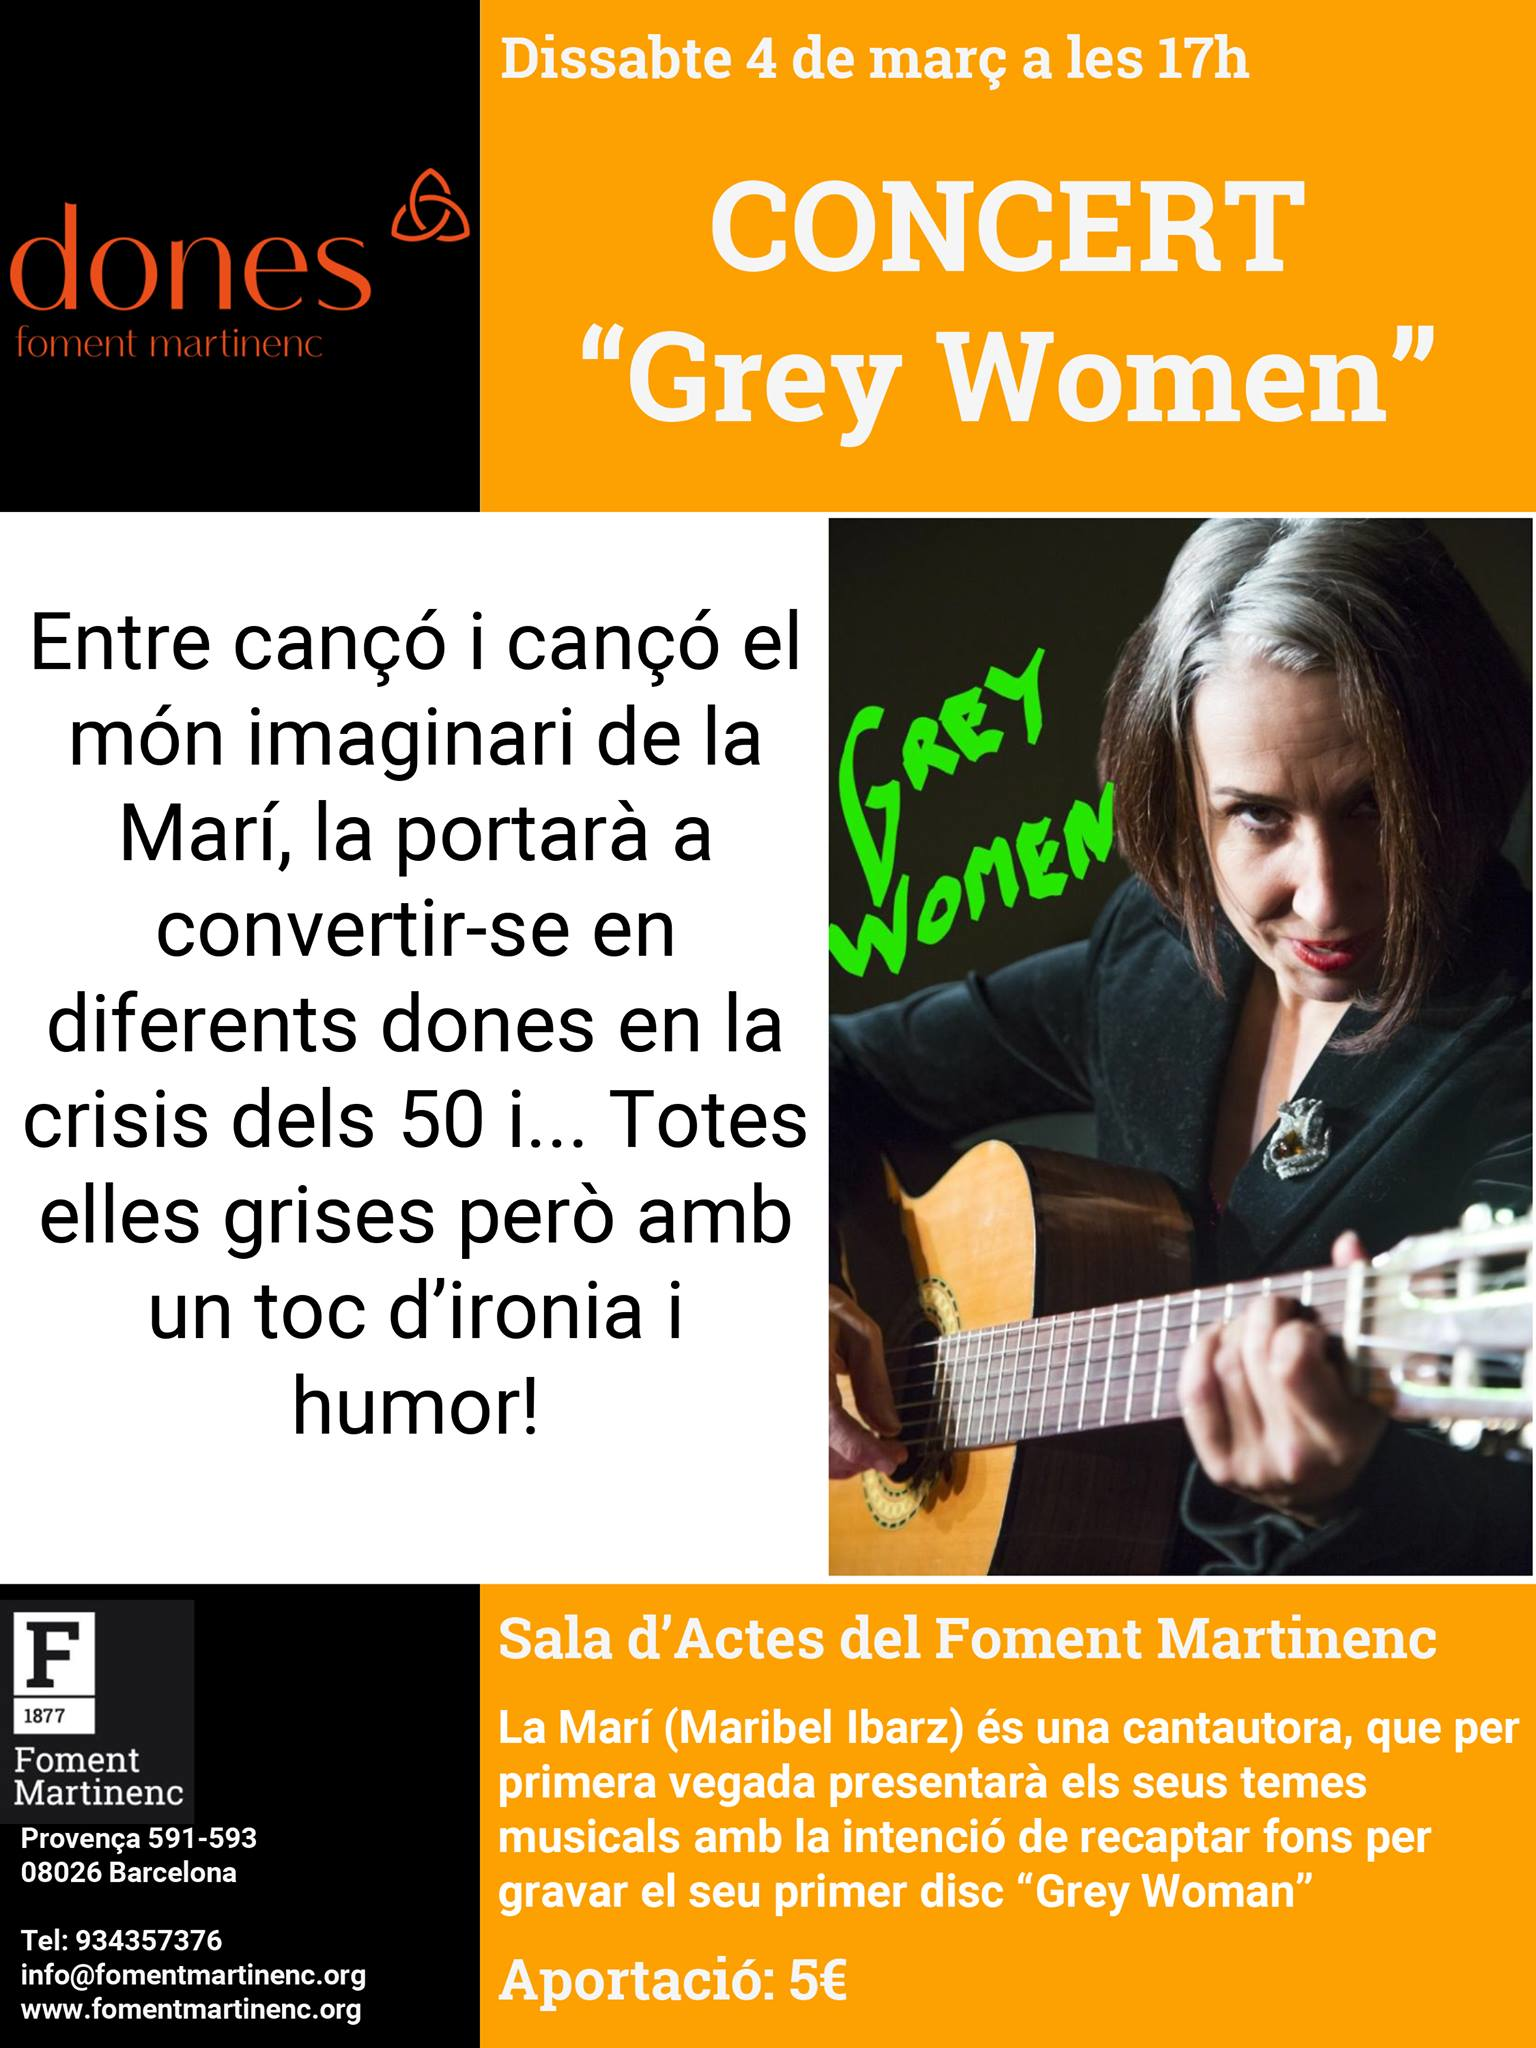 20170304_GreyWomen